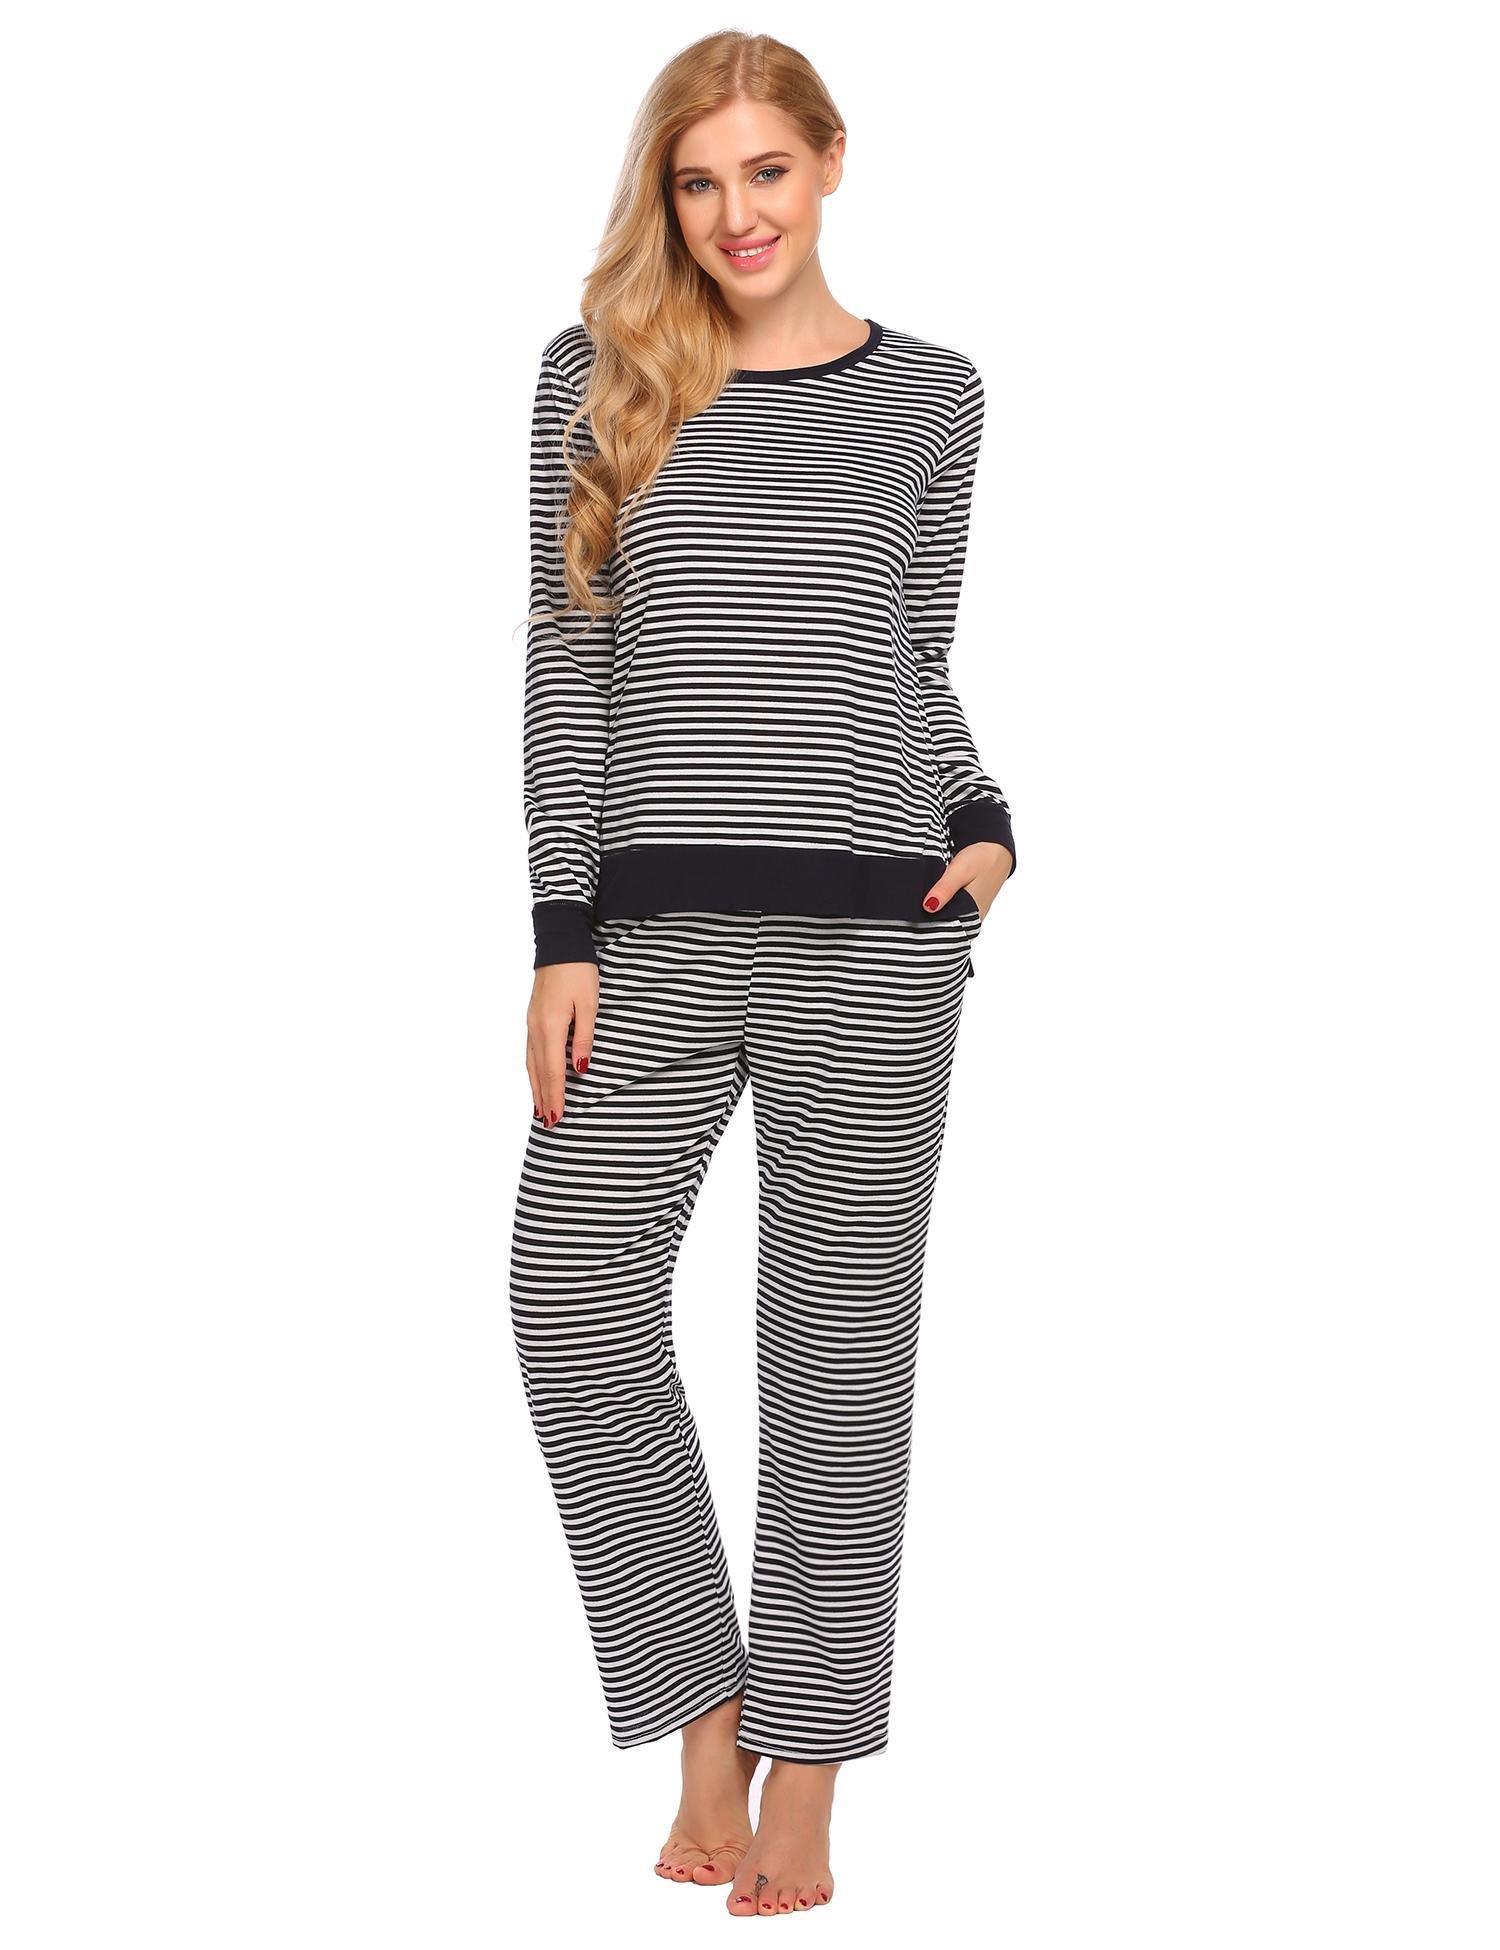 Skylin Women's O-neck Sleepwear Short Sleeves Top with Pants Pajama Set (Blue,XXL)